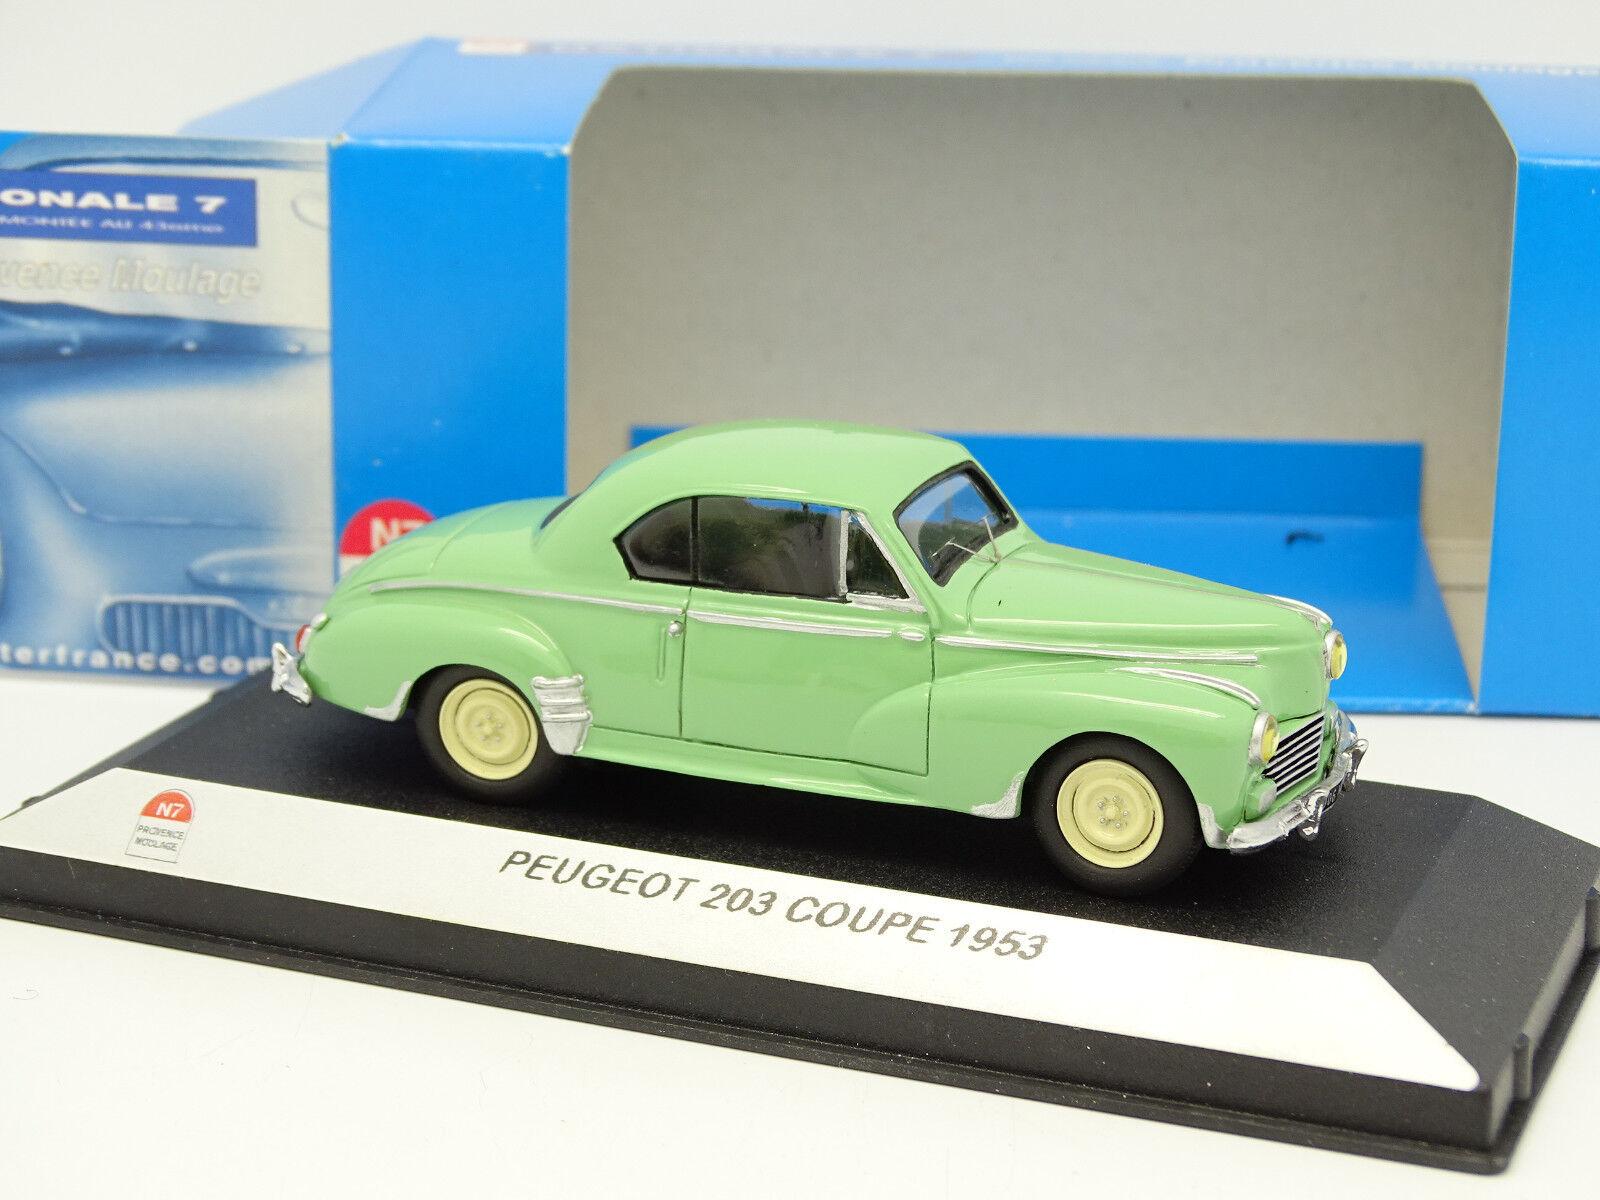 Starter N7 Provence Résine 1 43 - Peugeot 203 Coupe Verte 1953